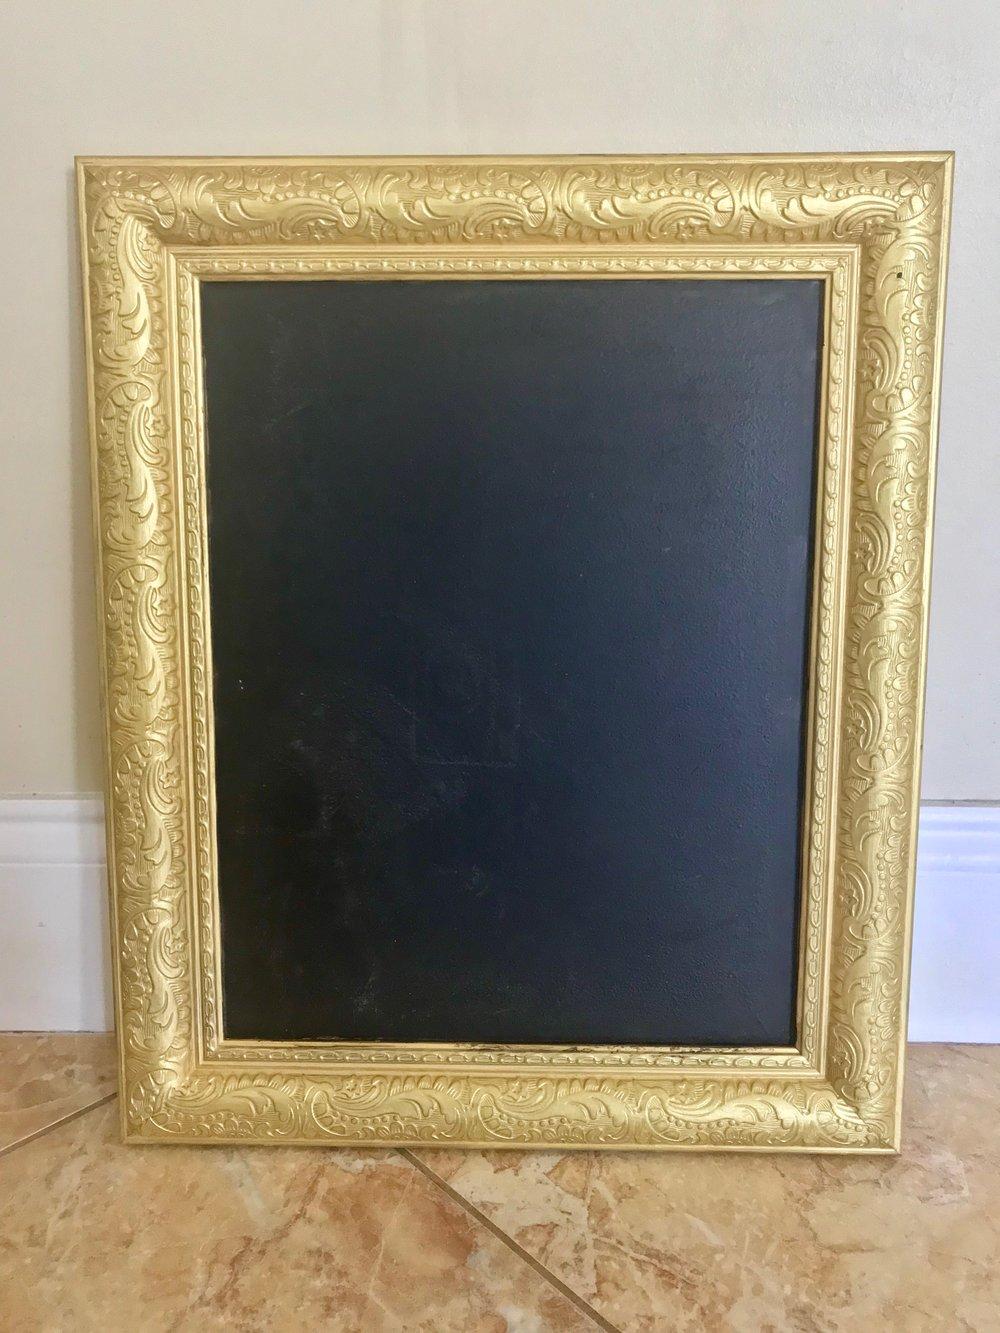 11x14 Gold Chalkboard